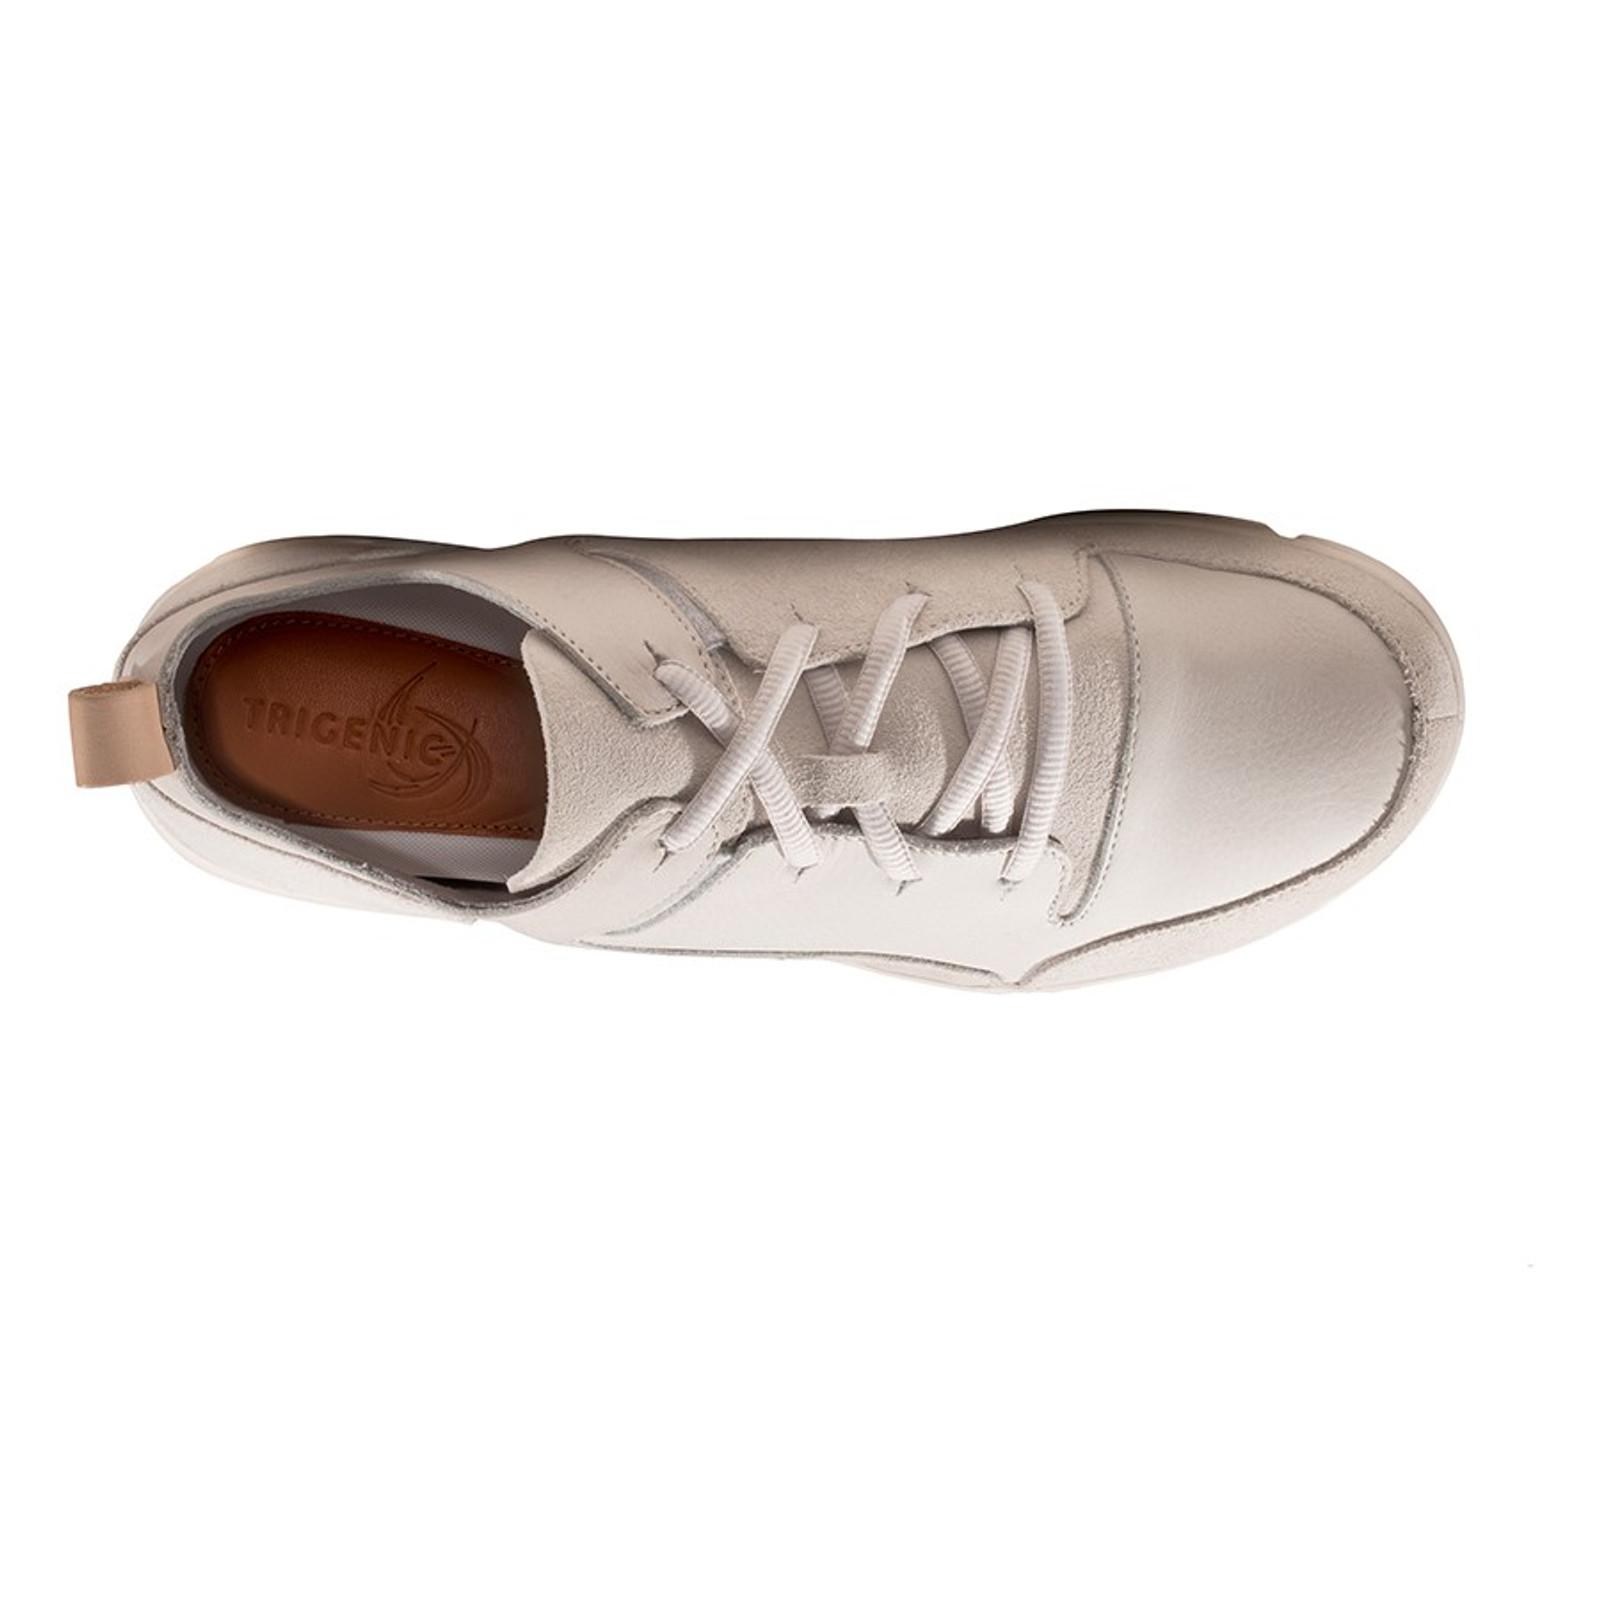 Clarks Mens TRI VERVE LACE White Leather